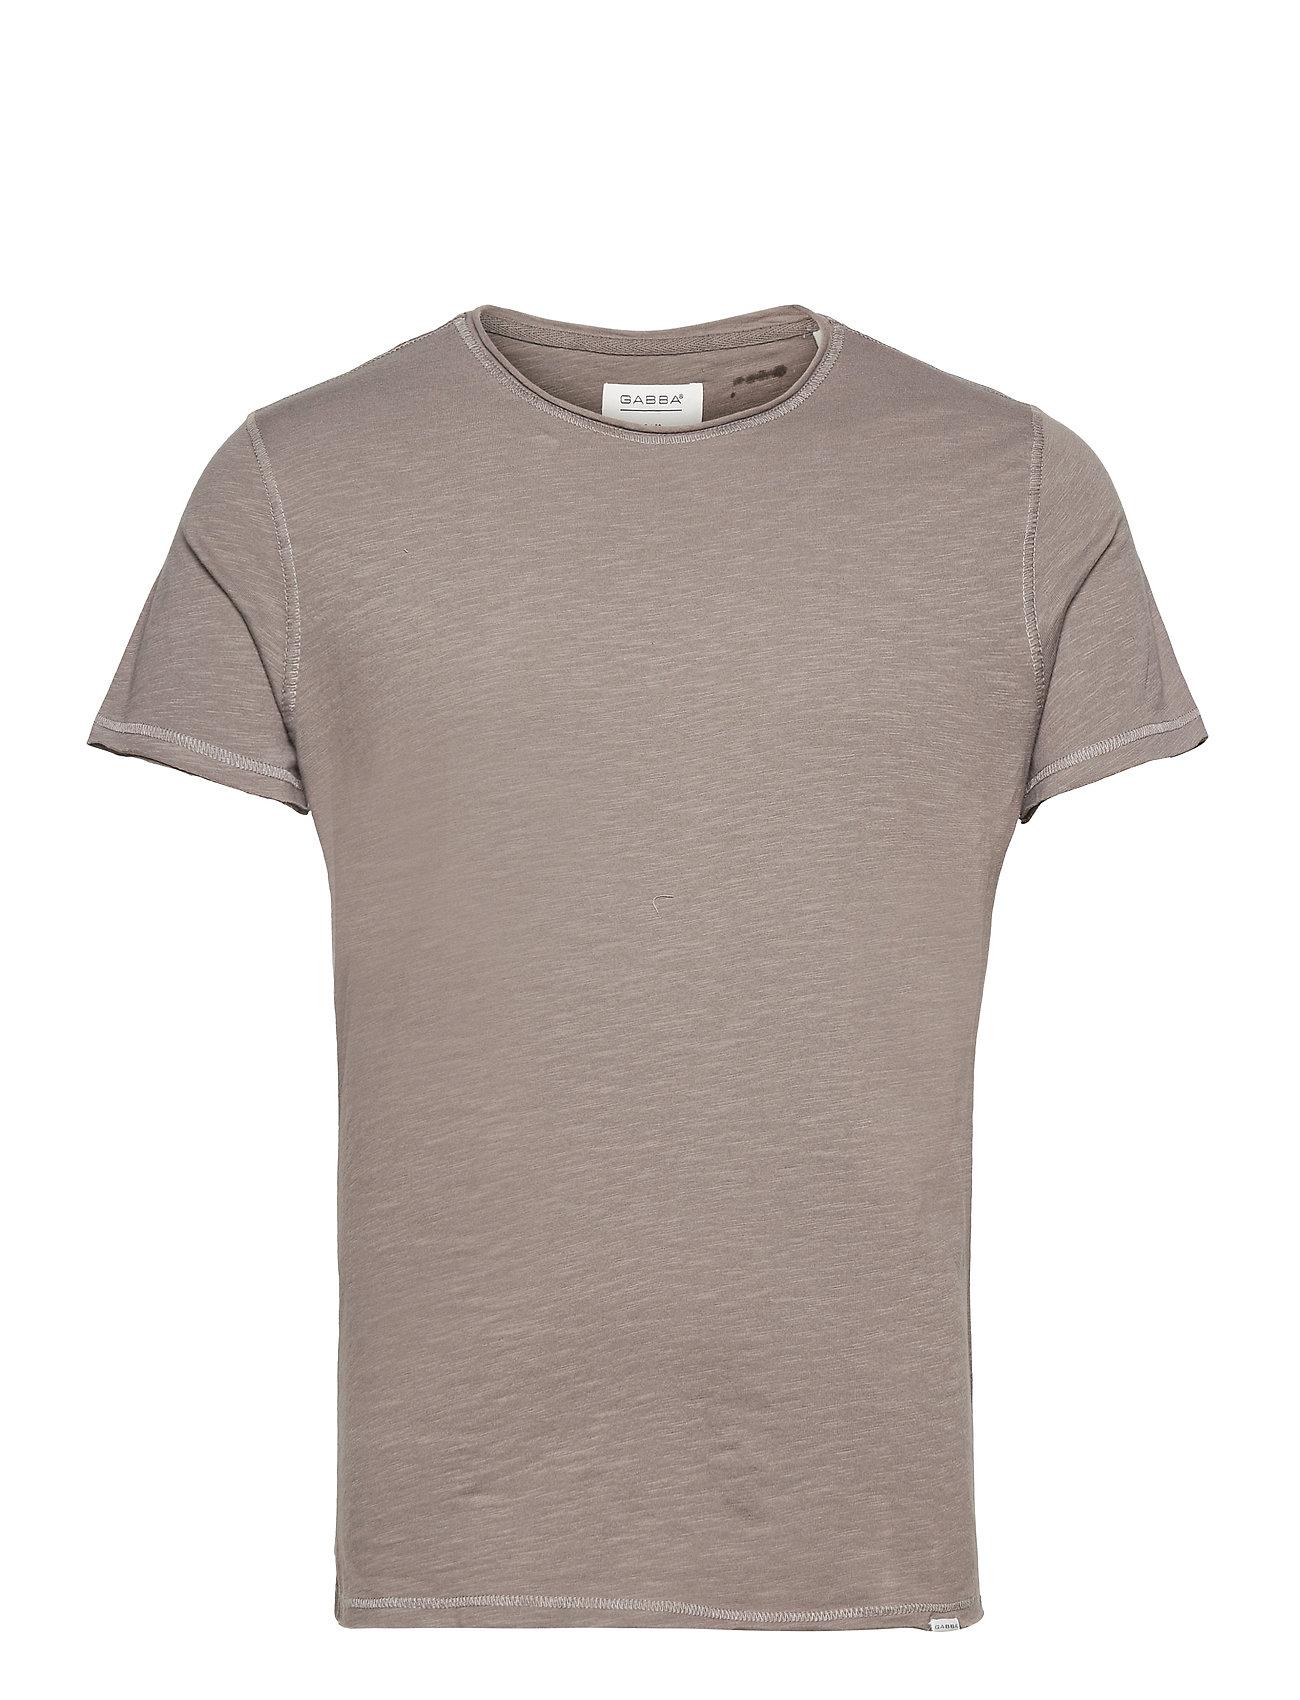 Image of Konrad Slub S/S Tee T-shirt Brun Gabba (3515876461)